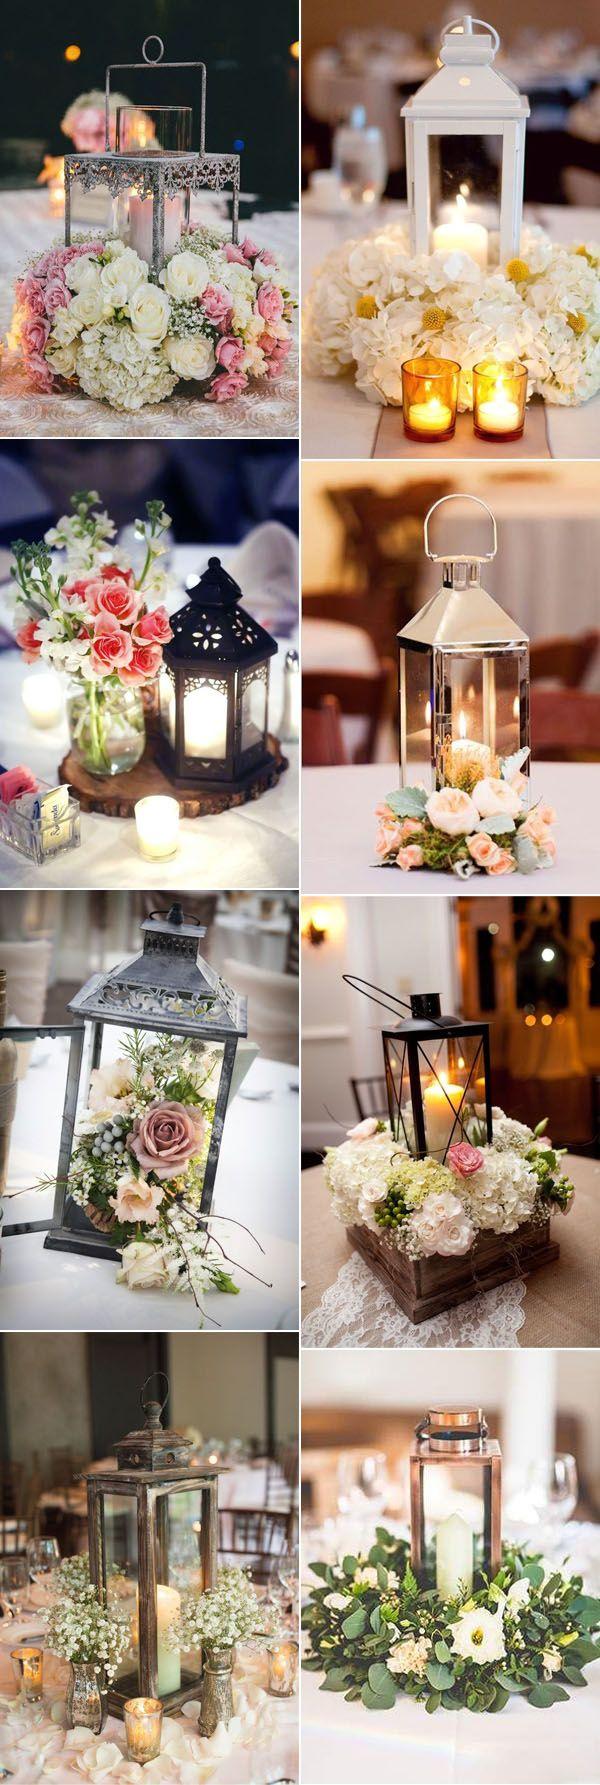 Ideas of wedding decorations   best Wedding images on Pinterest  Wedding ideas Short wedding